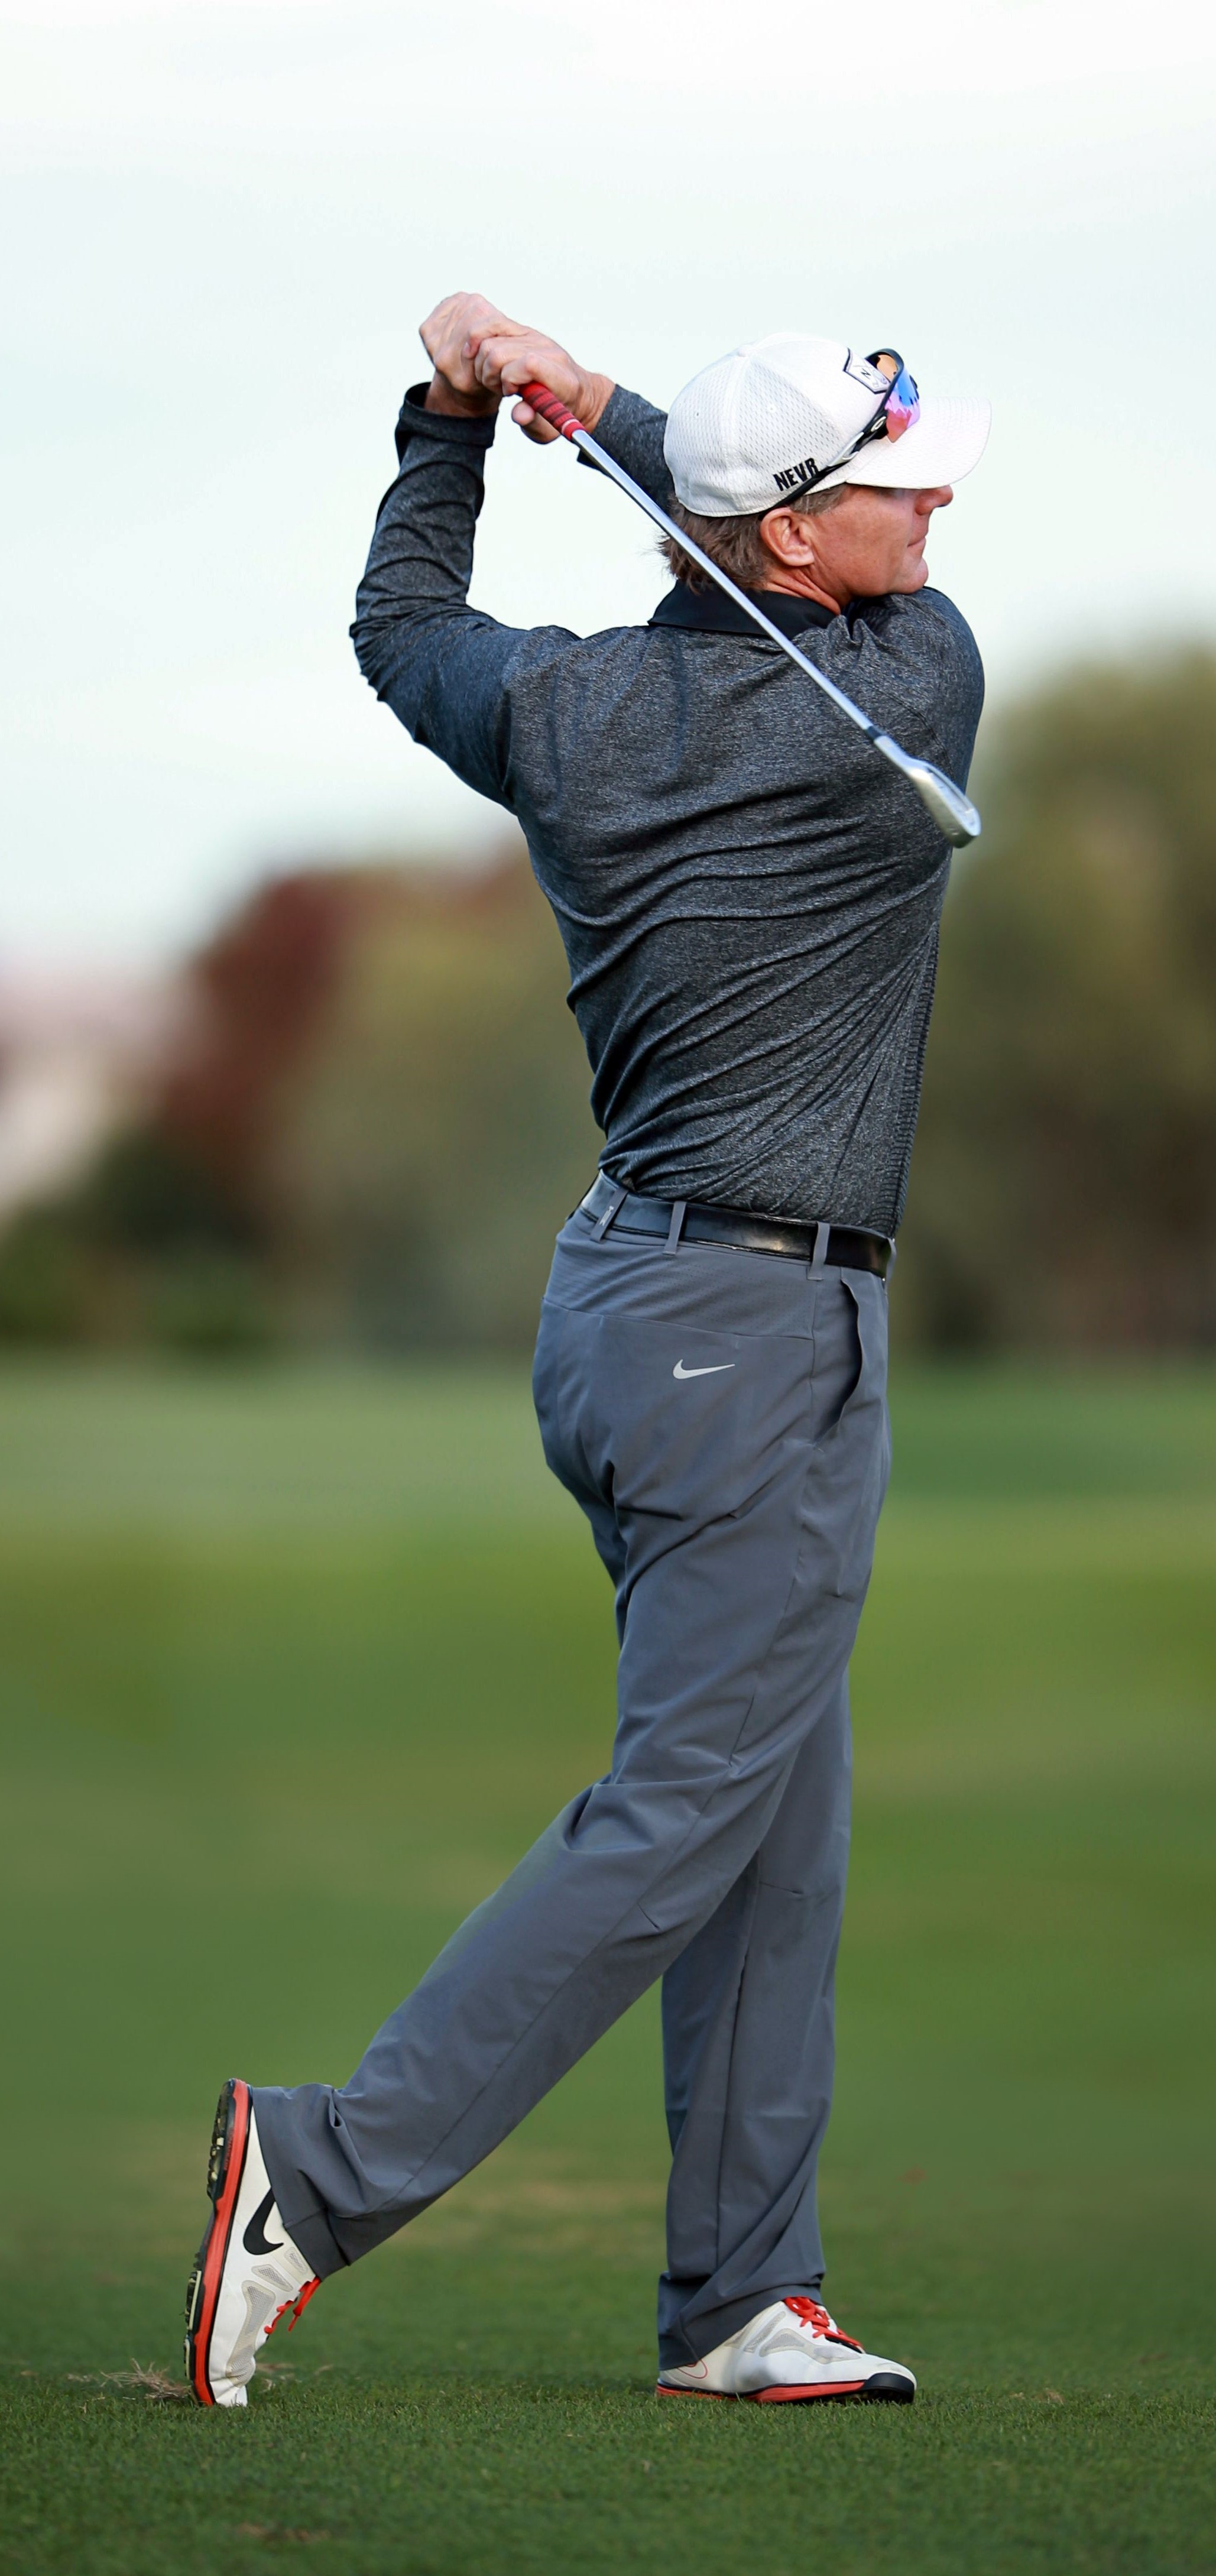 R.J. Weinmeier - Golf Professional